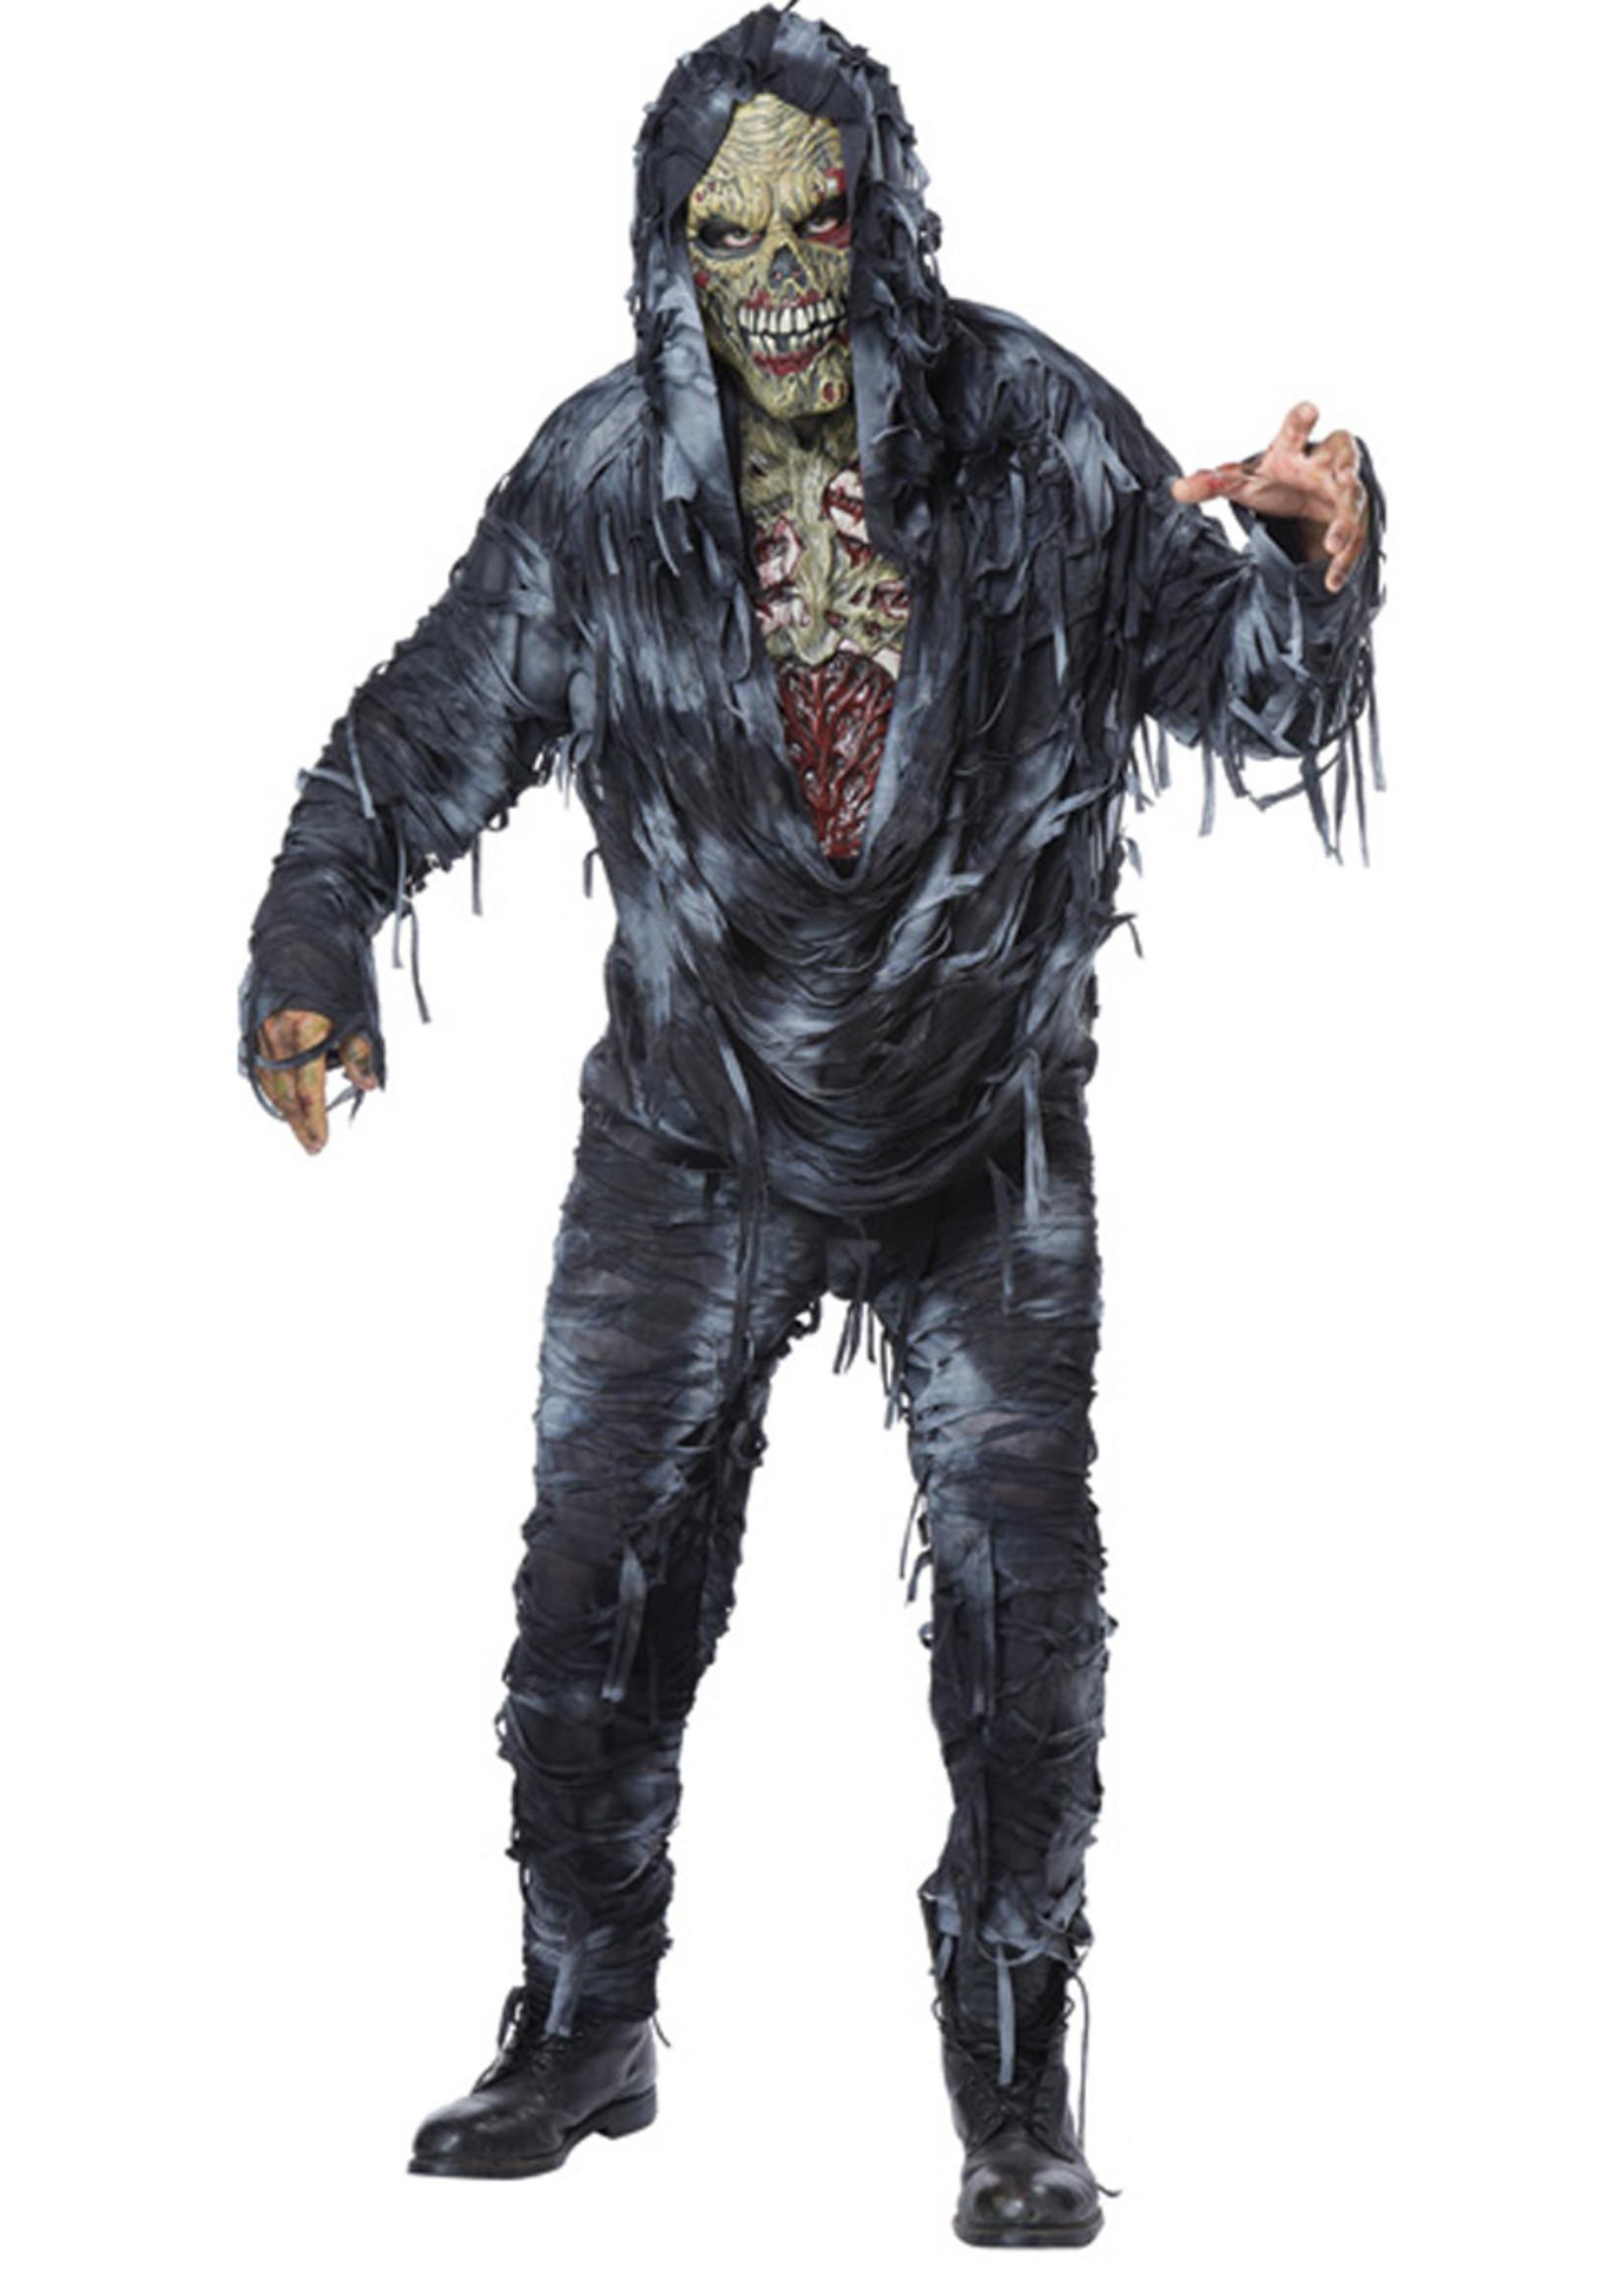 Rotten To The Core Costume - Men's